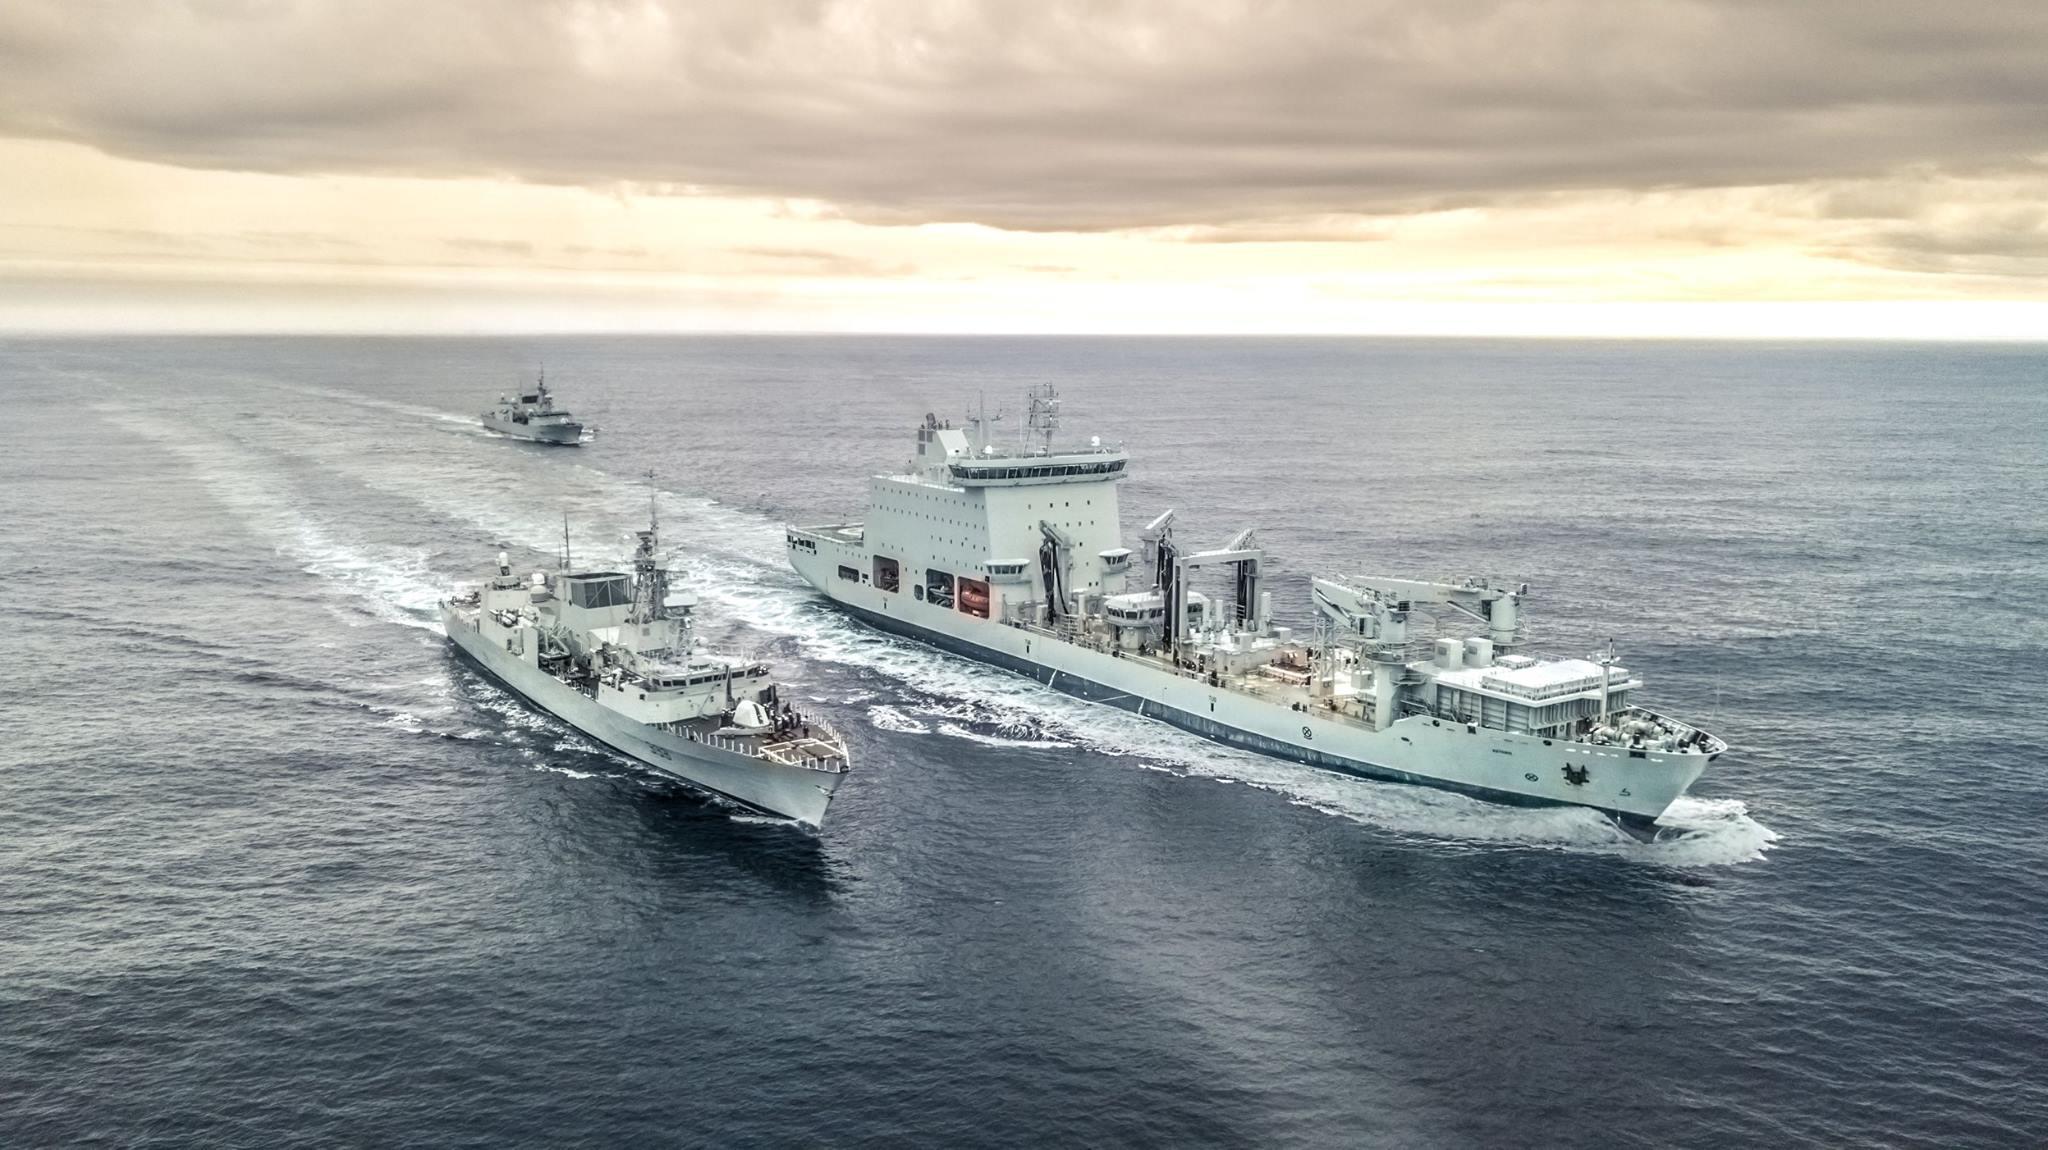 The MV Asterix, Davie's new naval replenishment unit (NRU) sails the Atlantic Ocean with HMCS Toronto and HMCS Montreal. The vessel is conducting a replenishment at sea off the coast of Halifax, Nova Scotia on January 17, 2018. (jeremy citone, chantier davie canada)